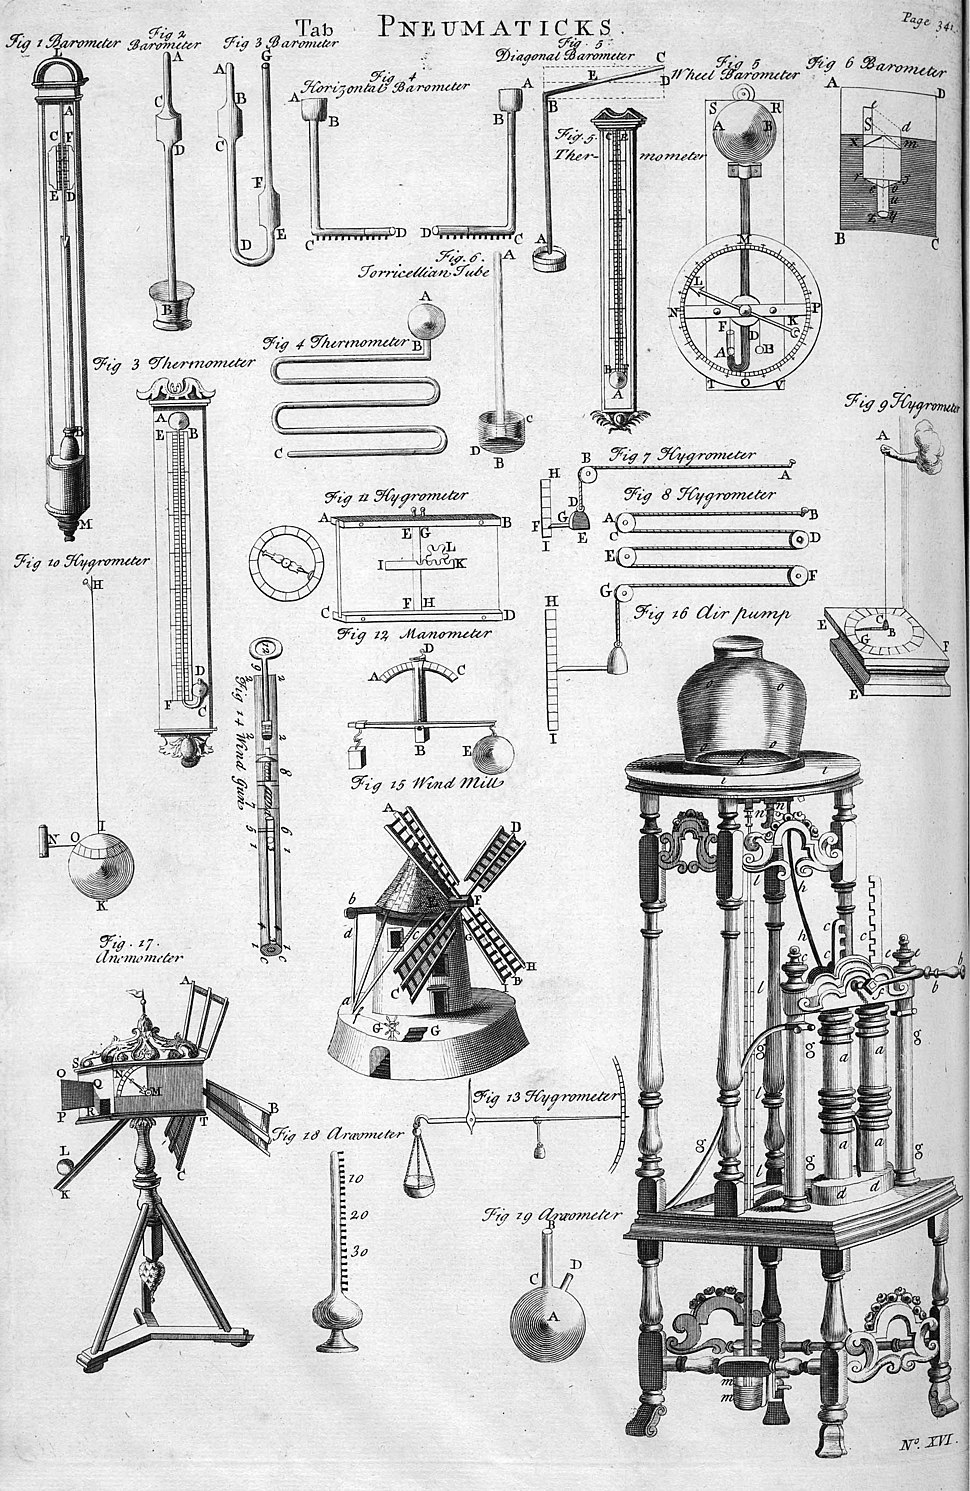 Table of Pneumaticks, Cyclopaedia, Volume 2